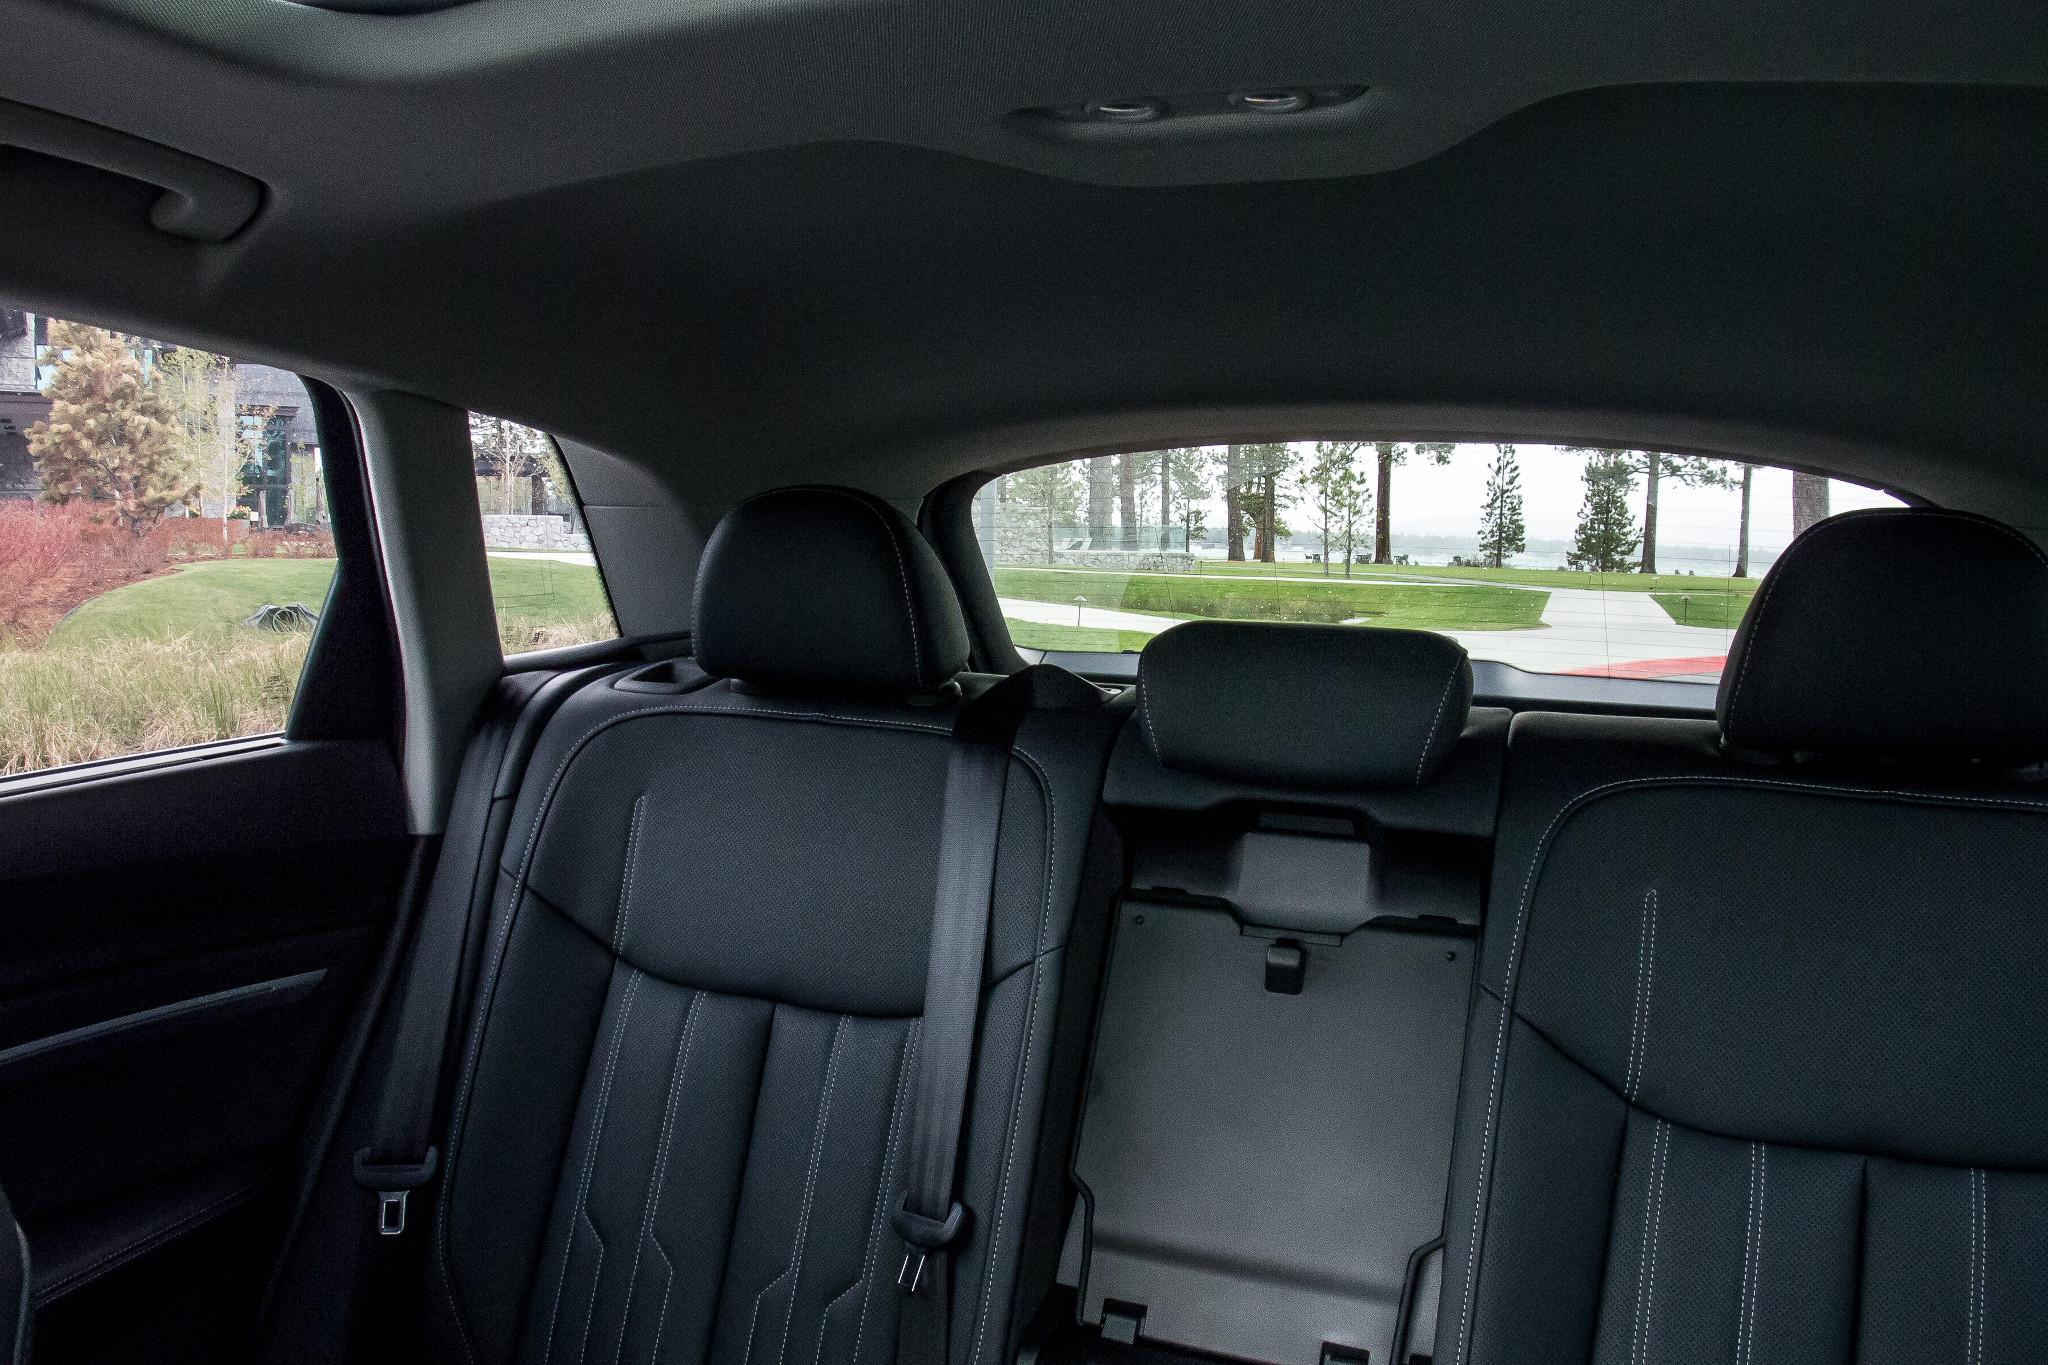 09-audi-e-tron-2019-interior--second-row.jpg